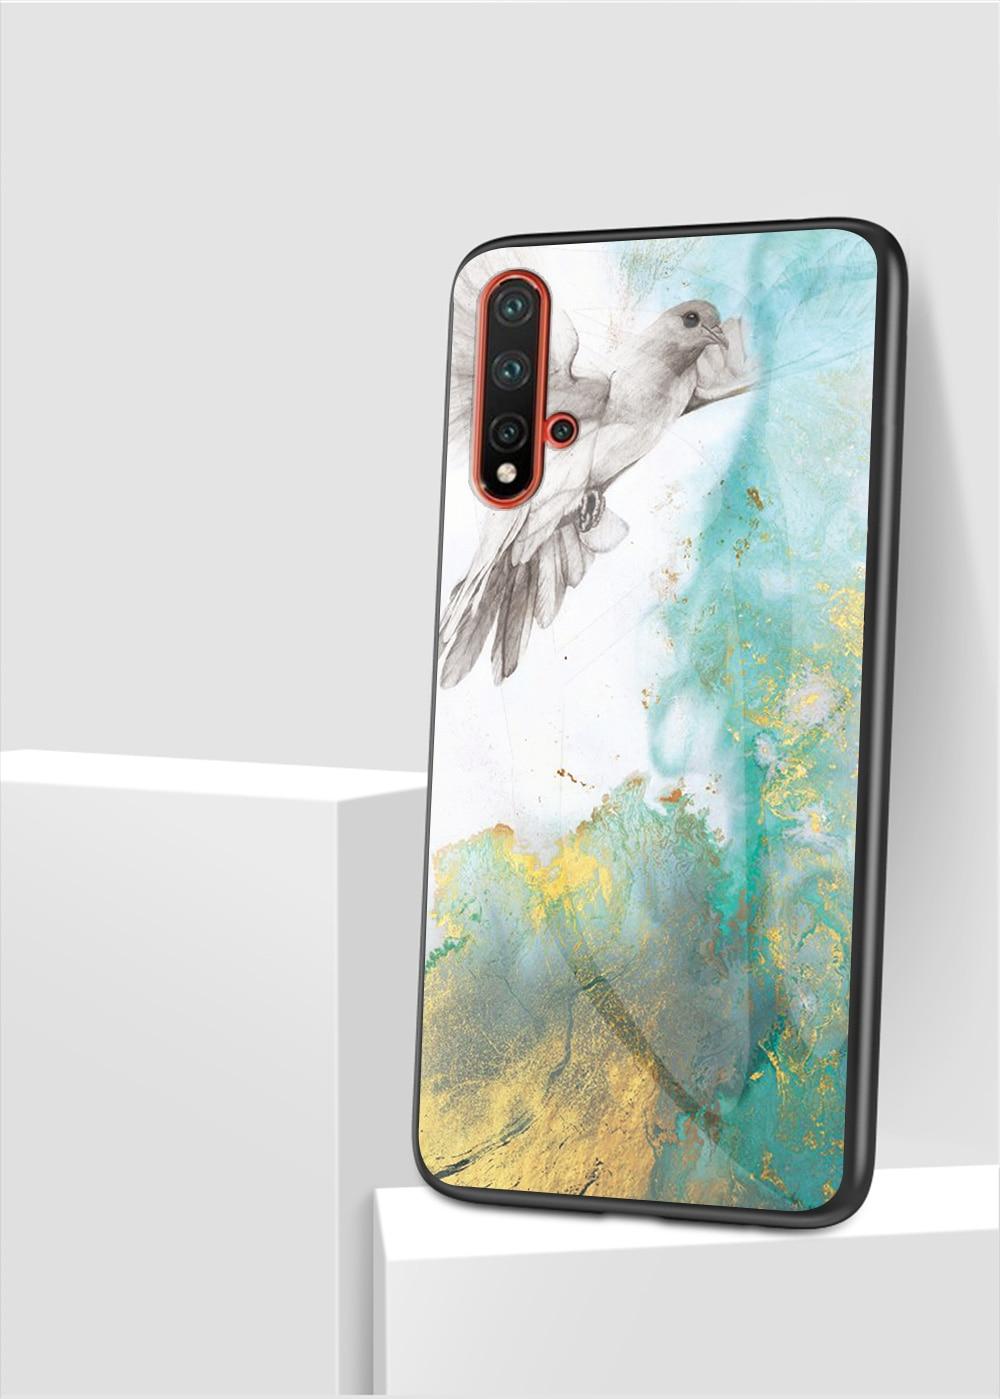 100pcs lot Marble Pattern Tempered Glass Soft TPU Frame Case For Huawei P20 Lite 2019 Nova